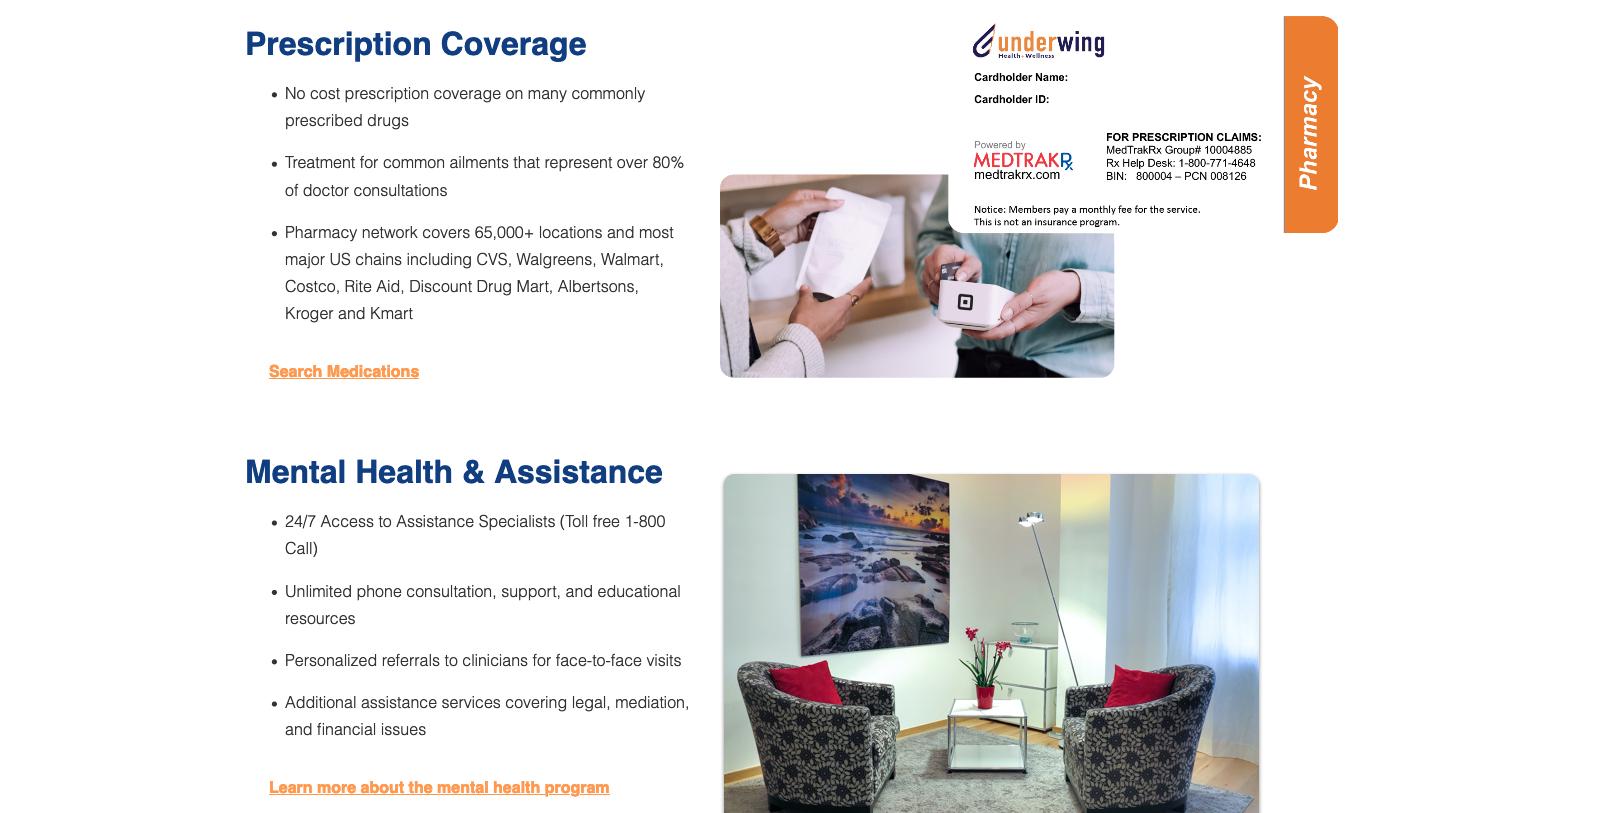 Grubhub home prescription coverage desktop